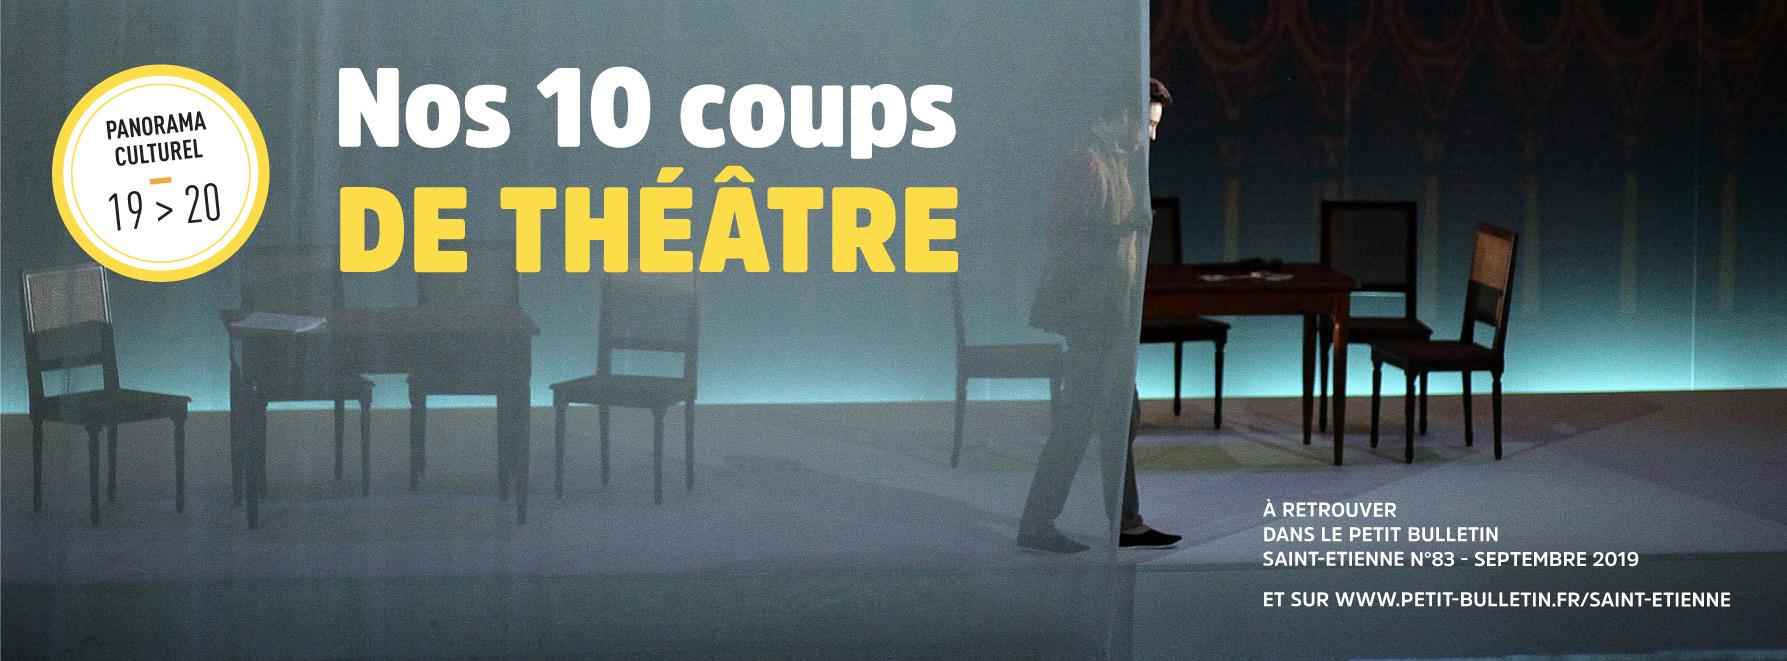 Panorama 19/20 : nos 10 coups de théâtre